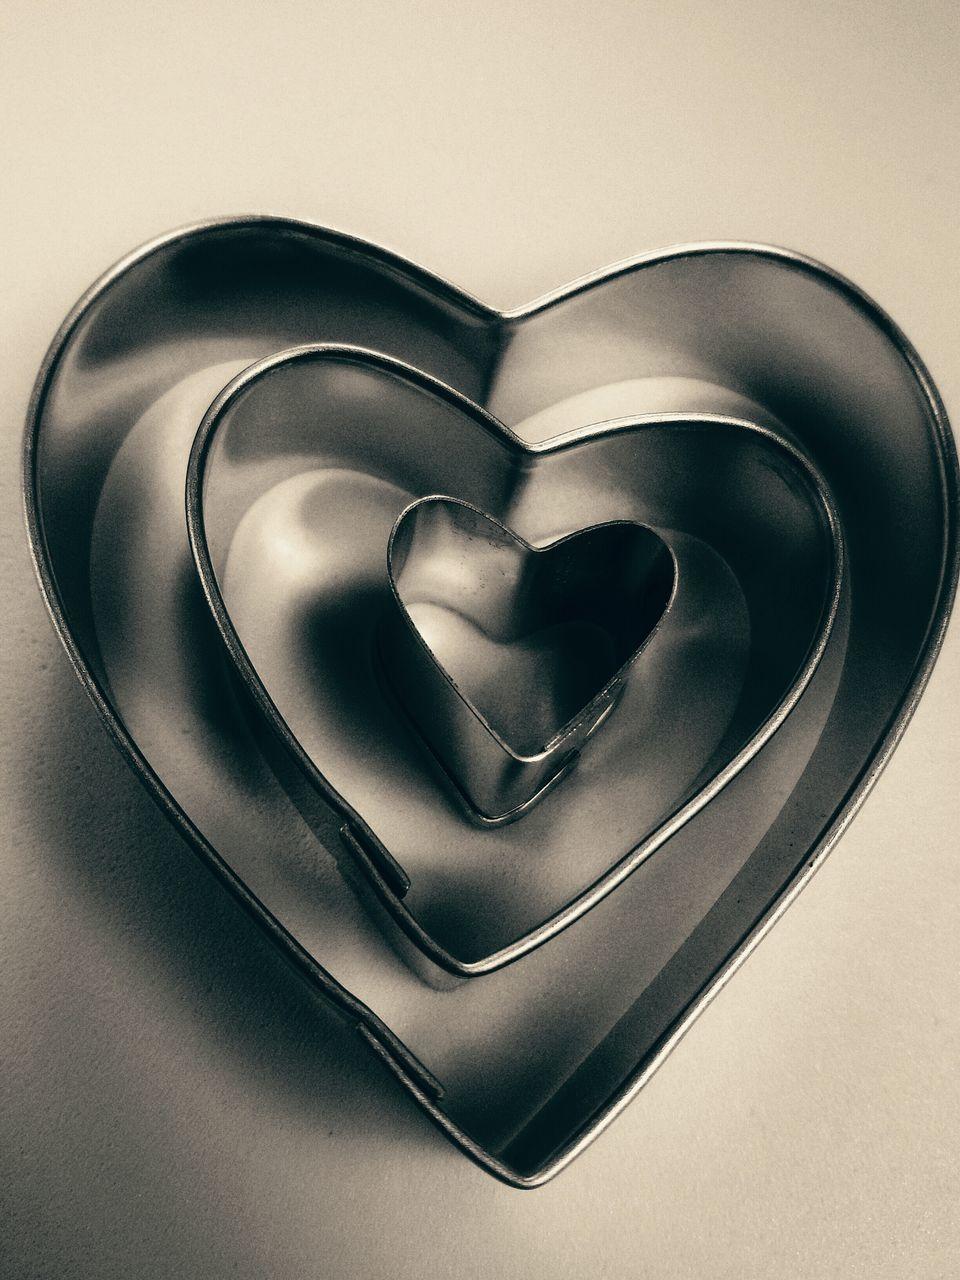 Three Heart-Shaped Baking Cutters Arranged In Size